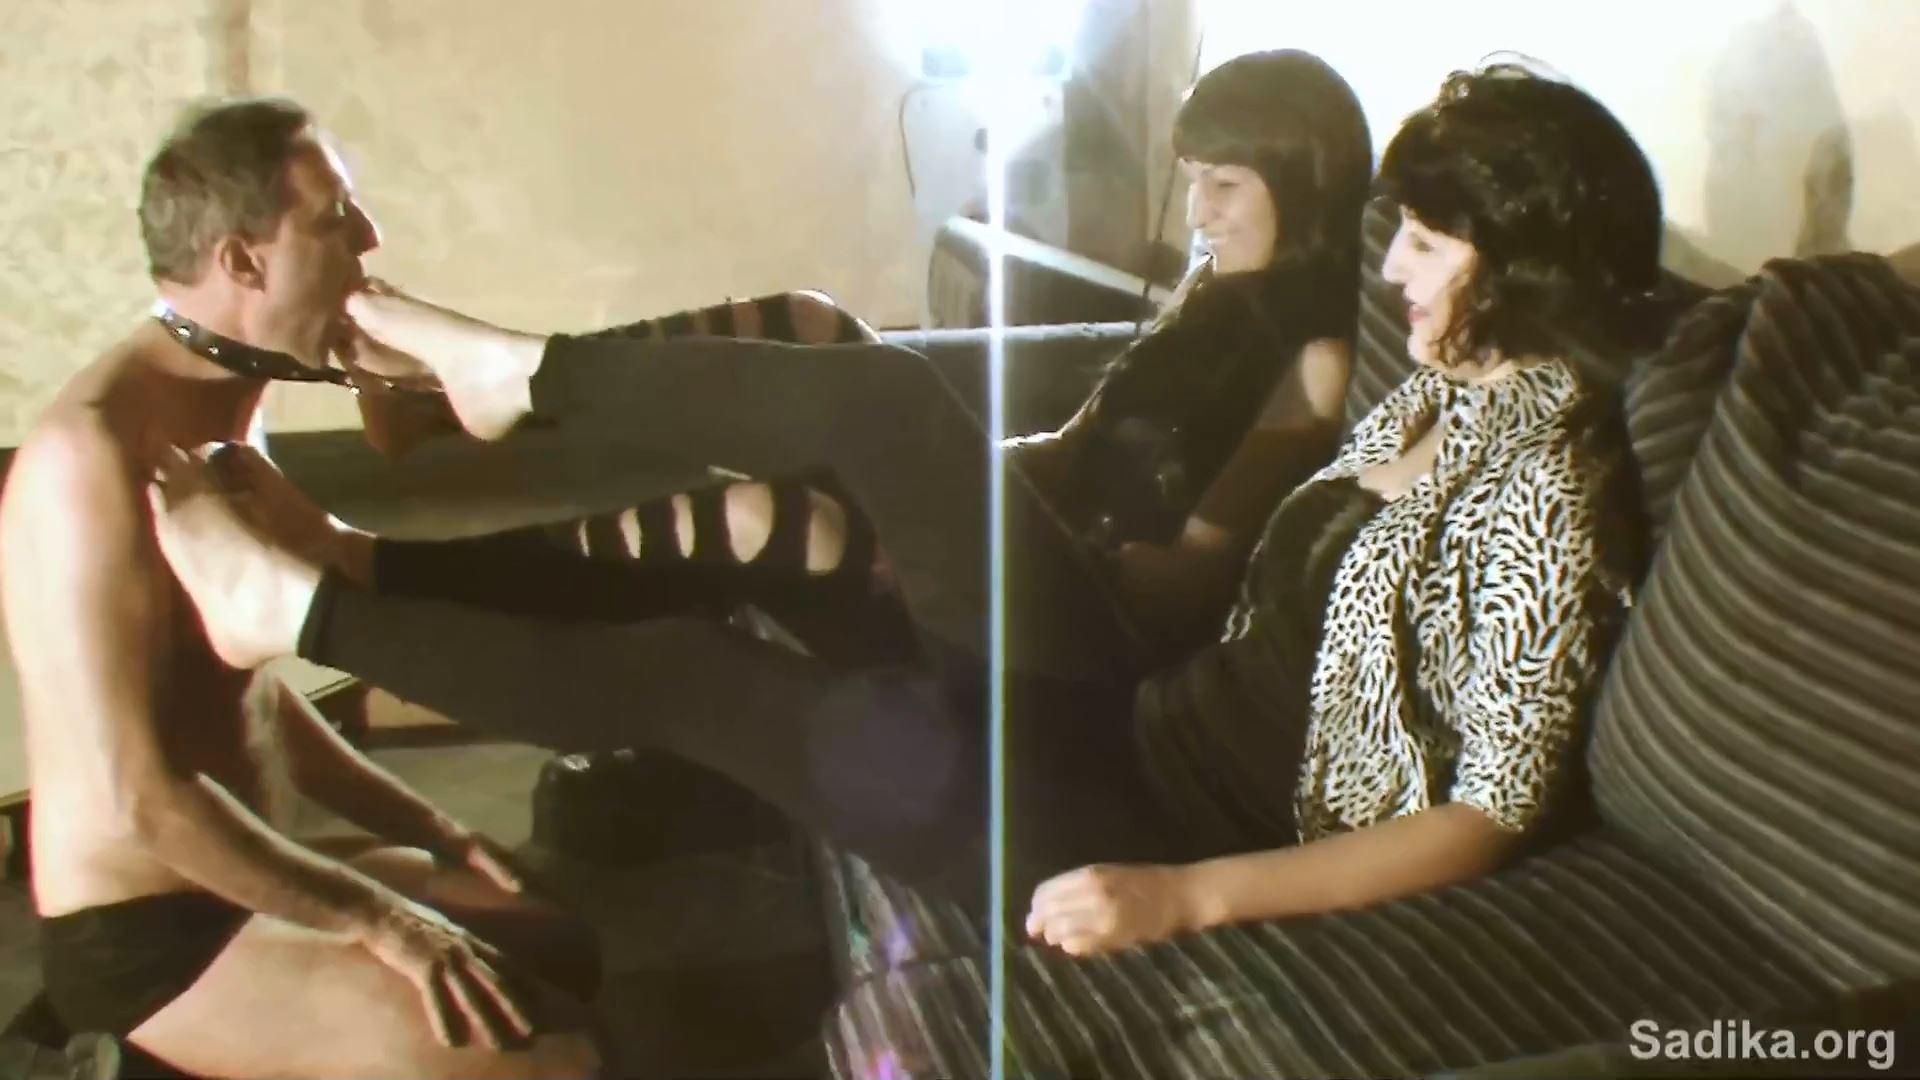 Jennyfer Cruel In Scene: Pony And Feet Wroship - WOMEN WEIGHT / SADIKA - FULL HD/1080p/MP4